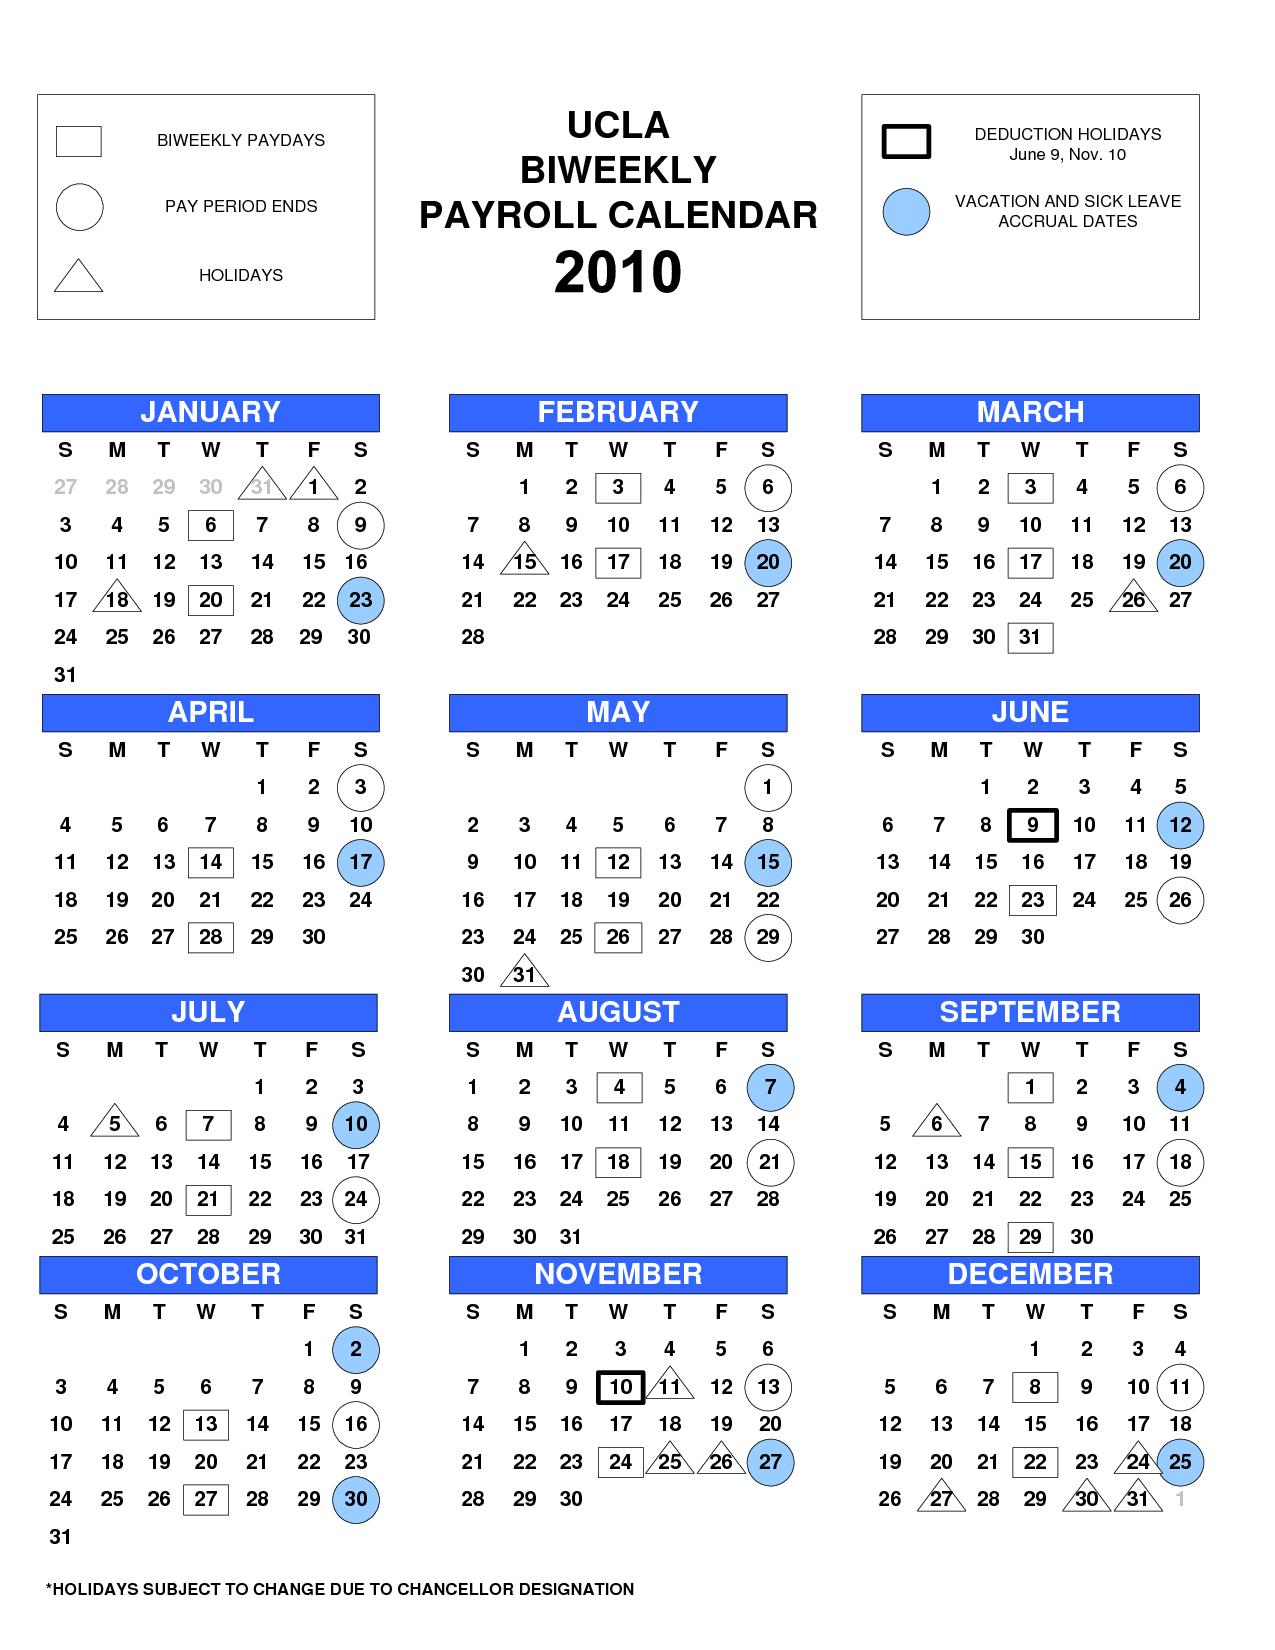 Uc Payroll Calendar 2018 | Payroll Calendars regarding Uc Berkeley Biweekly Pay Calendar 2020